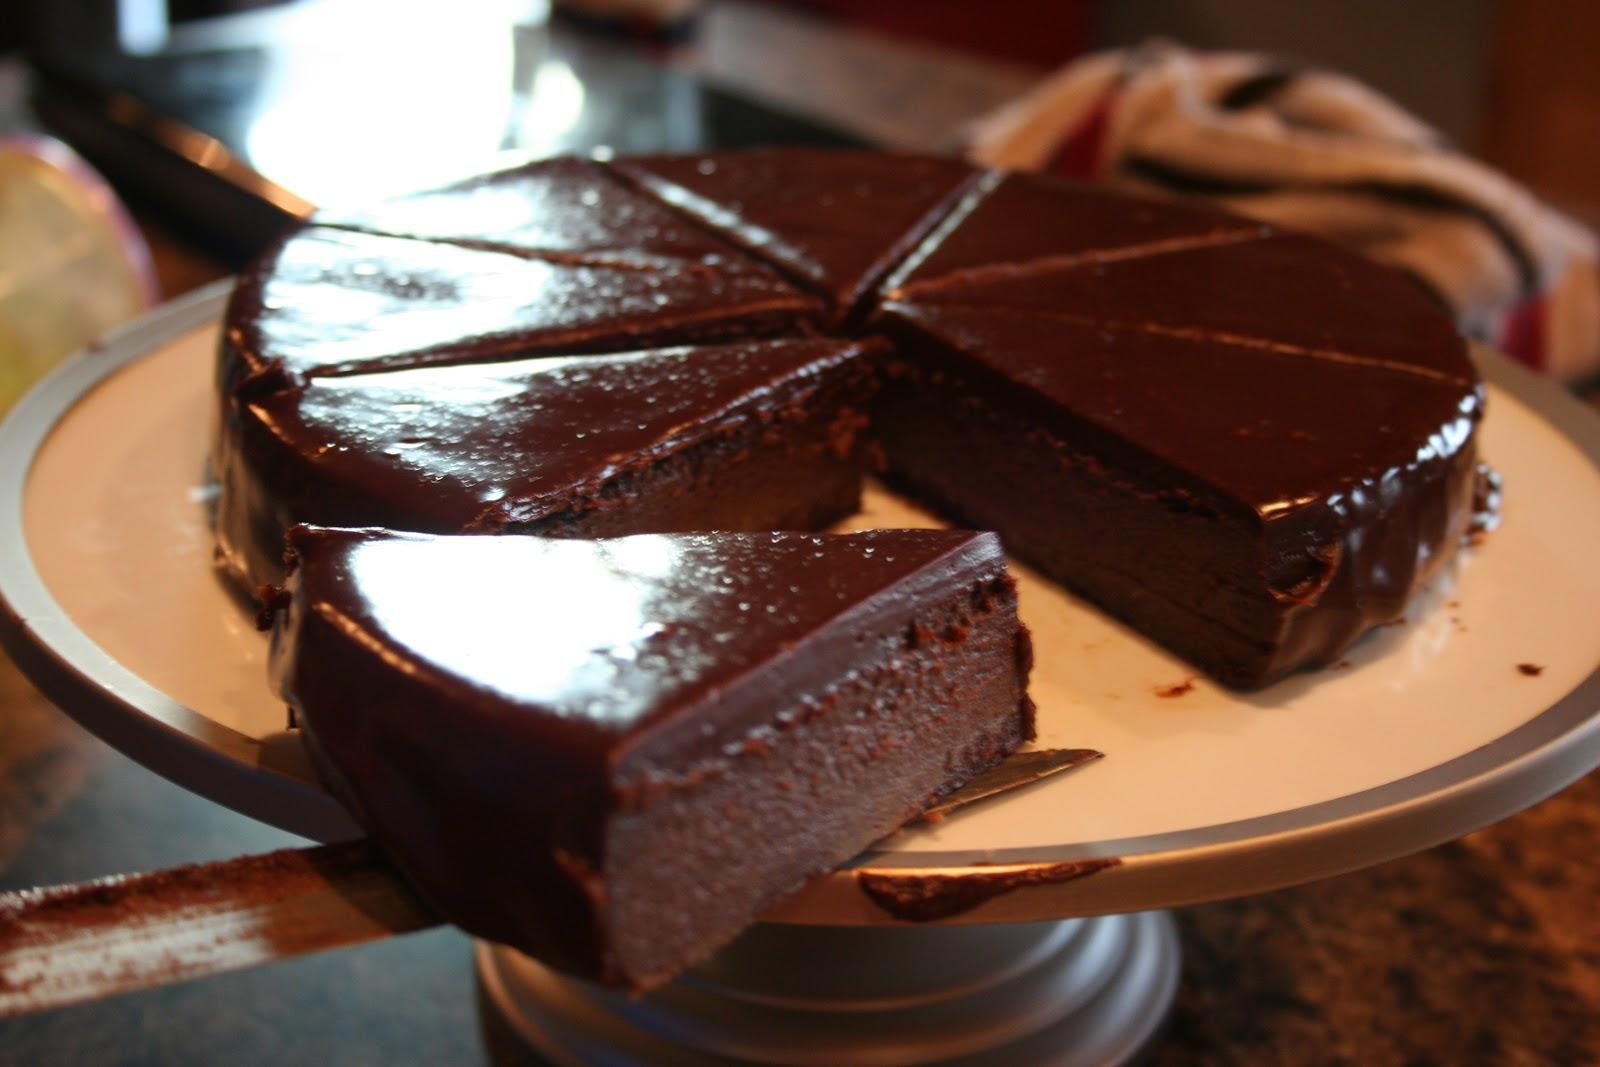 Flourless Chocolate Cake Recipe With Cocoa Powder